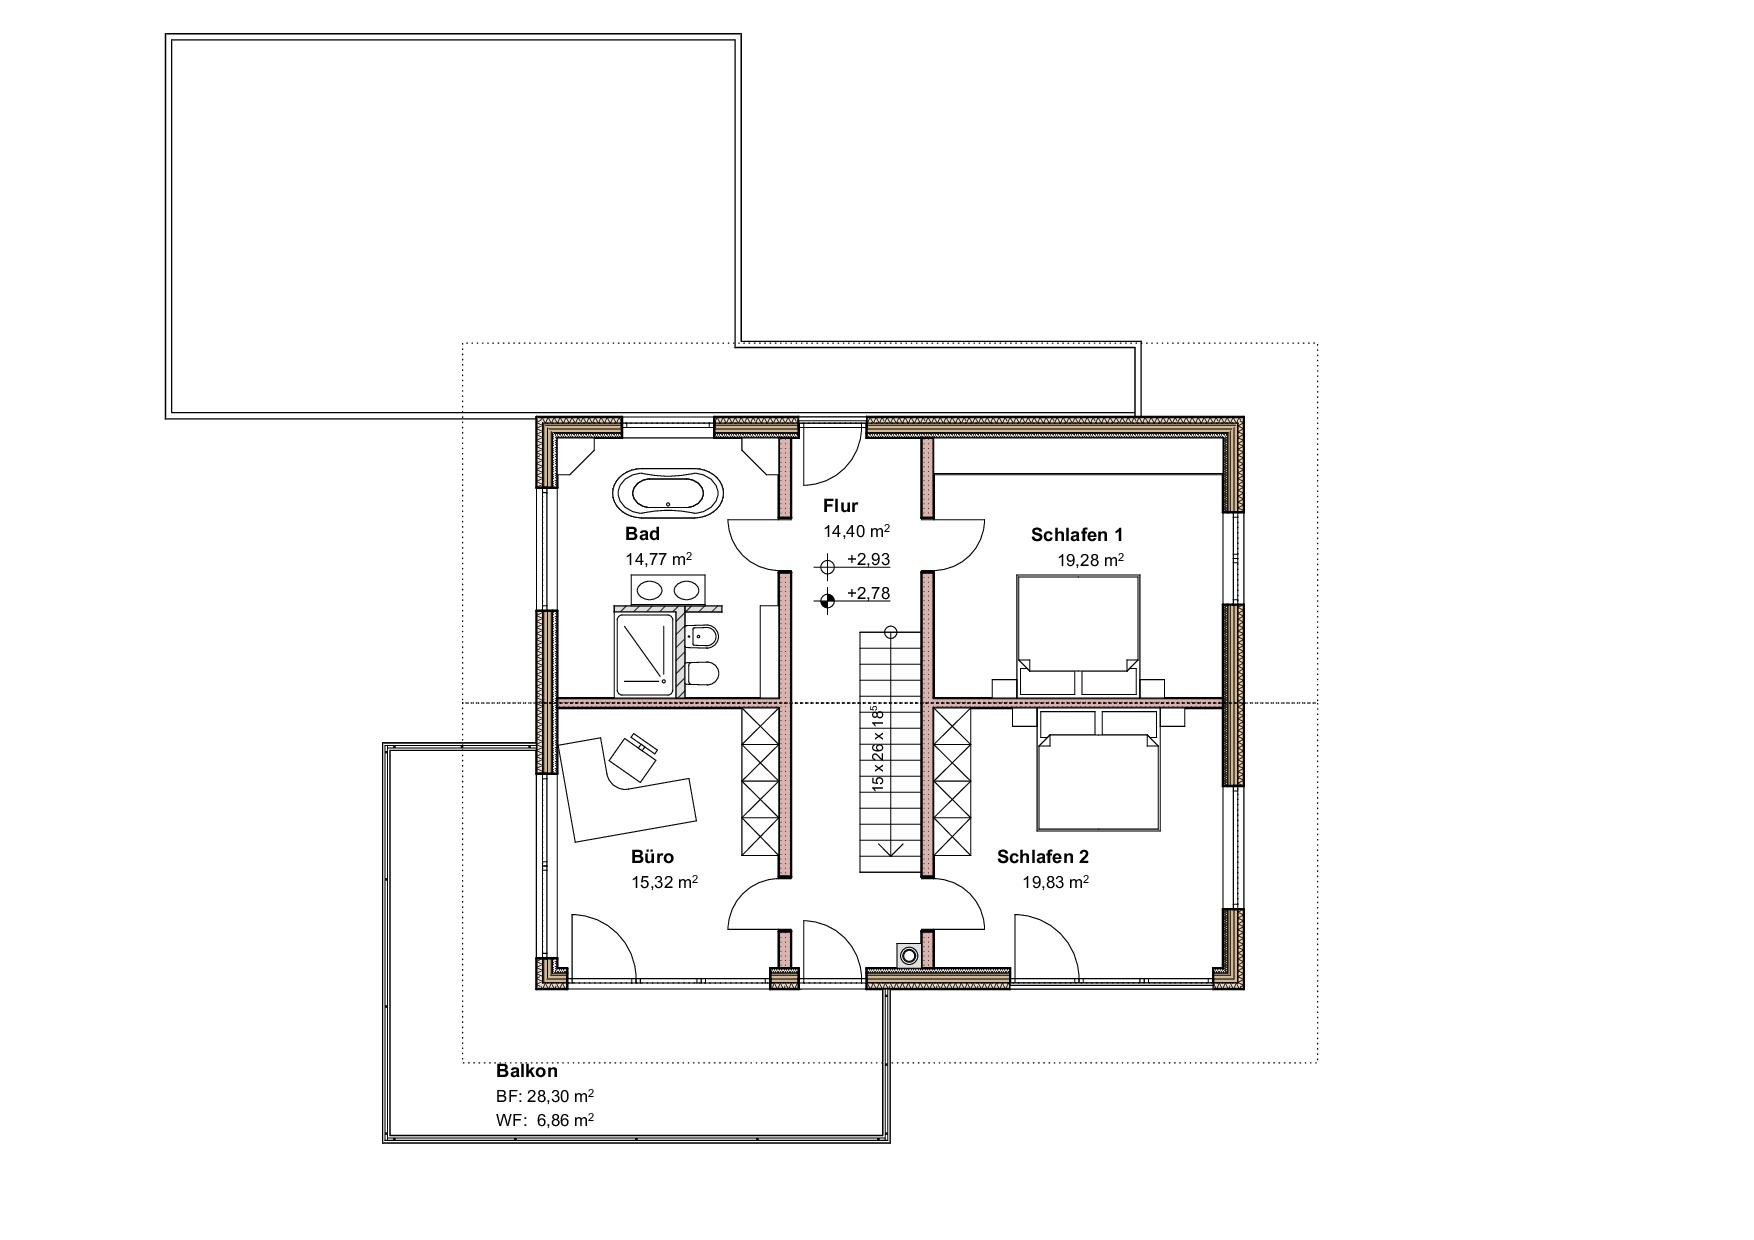 Grundriss, Obergeschoss, Einfamilienhaus in Oberstaufen